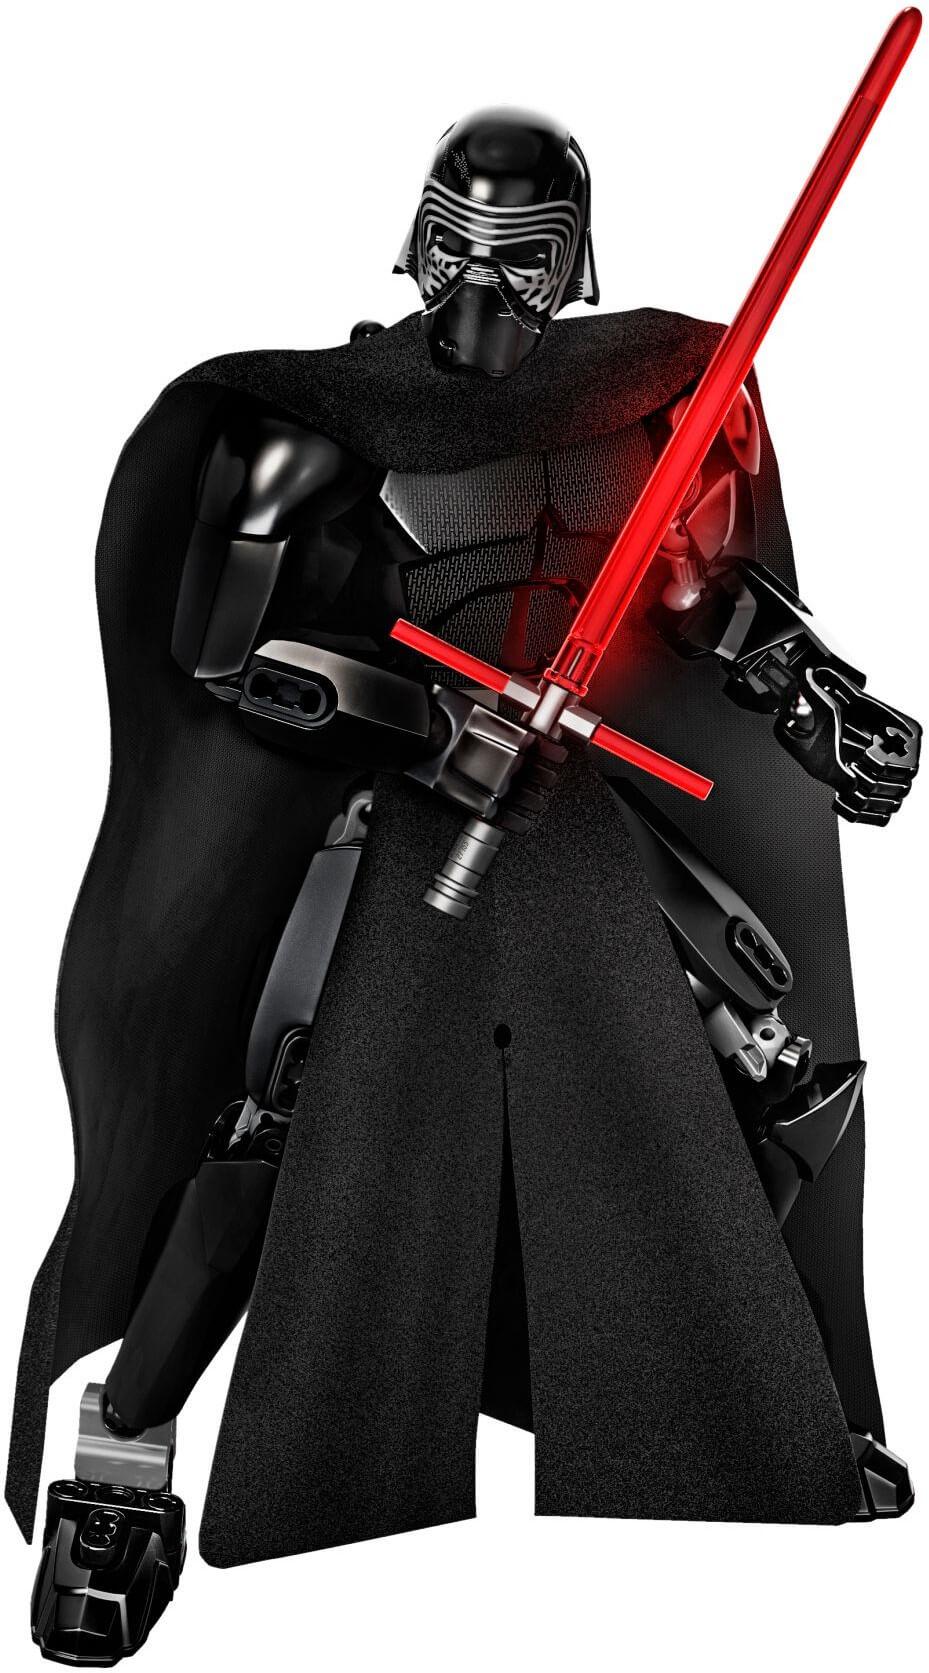 Mua đồ chơi LEGO 75117 - LEGO Star Wars 75117 - Kylo Ren (LEGO Star Wars Kylo Ren 75117)